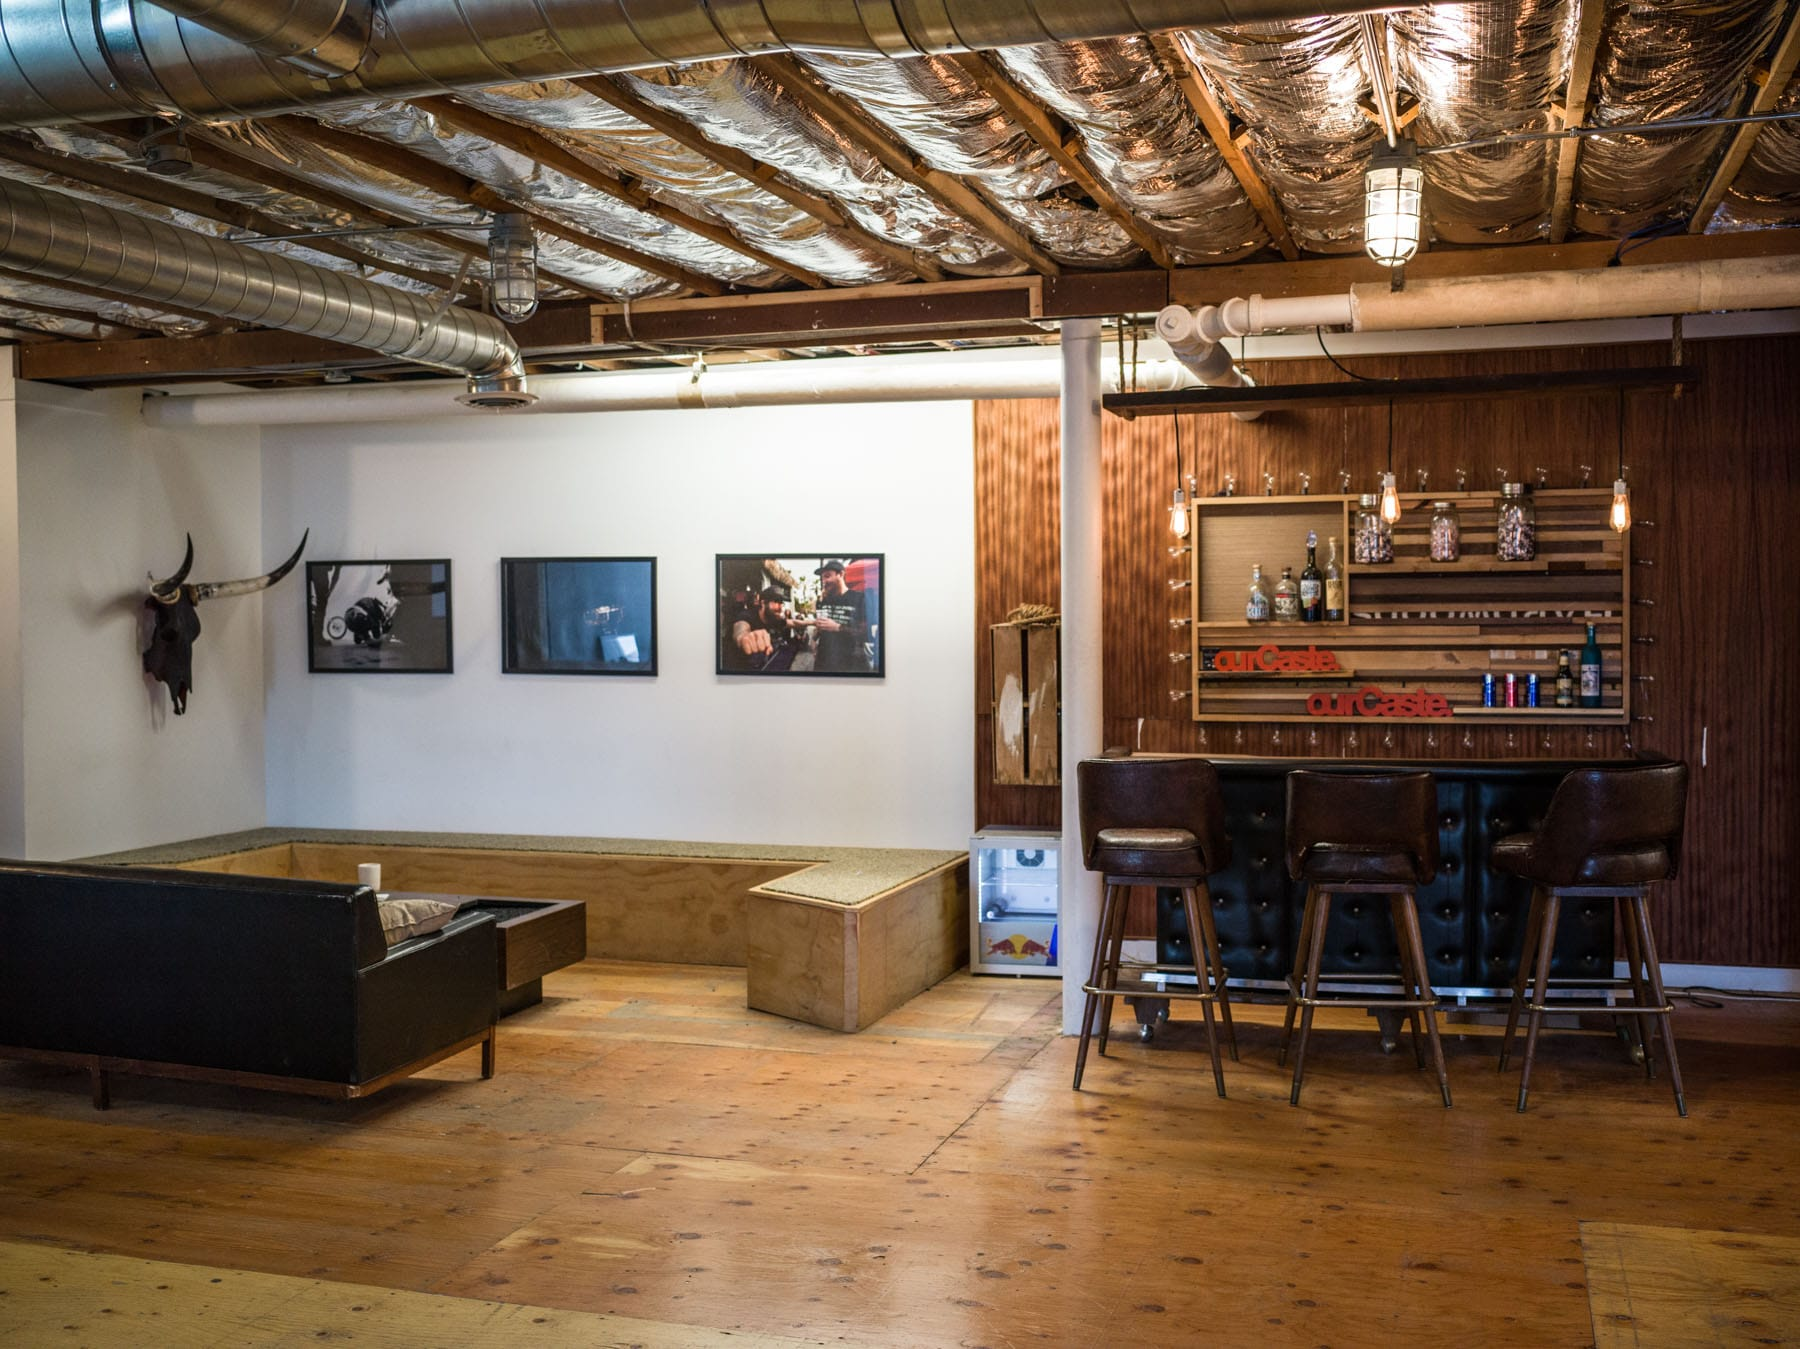 Windermere-Commercial-Real-Estate-Utah-Hip-Industrial-Creative-Office-Space2